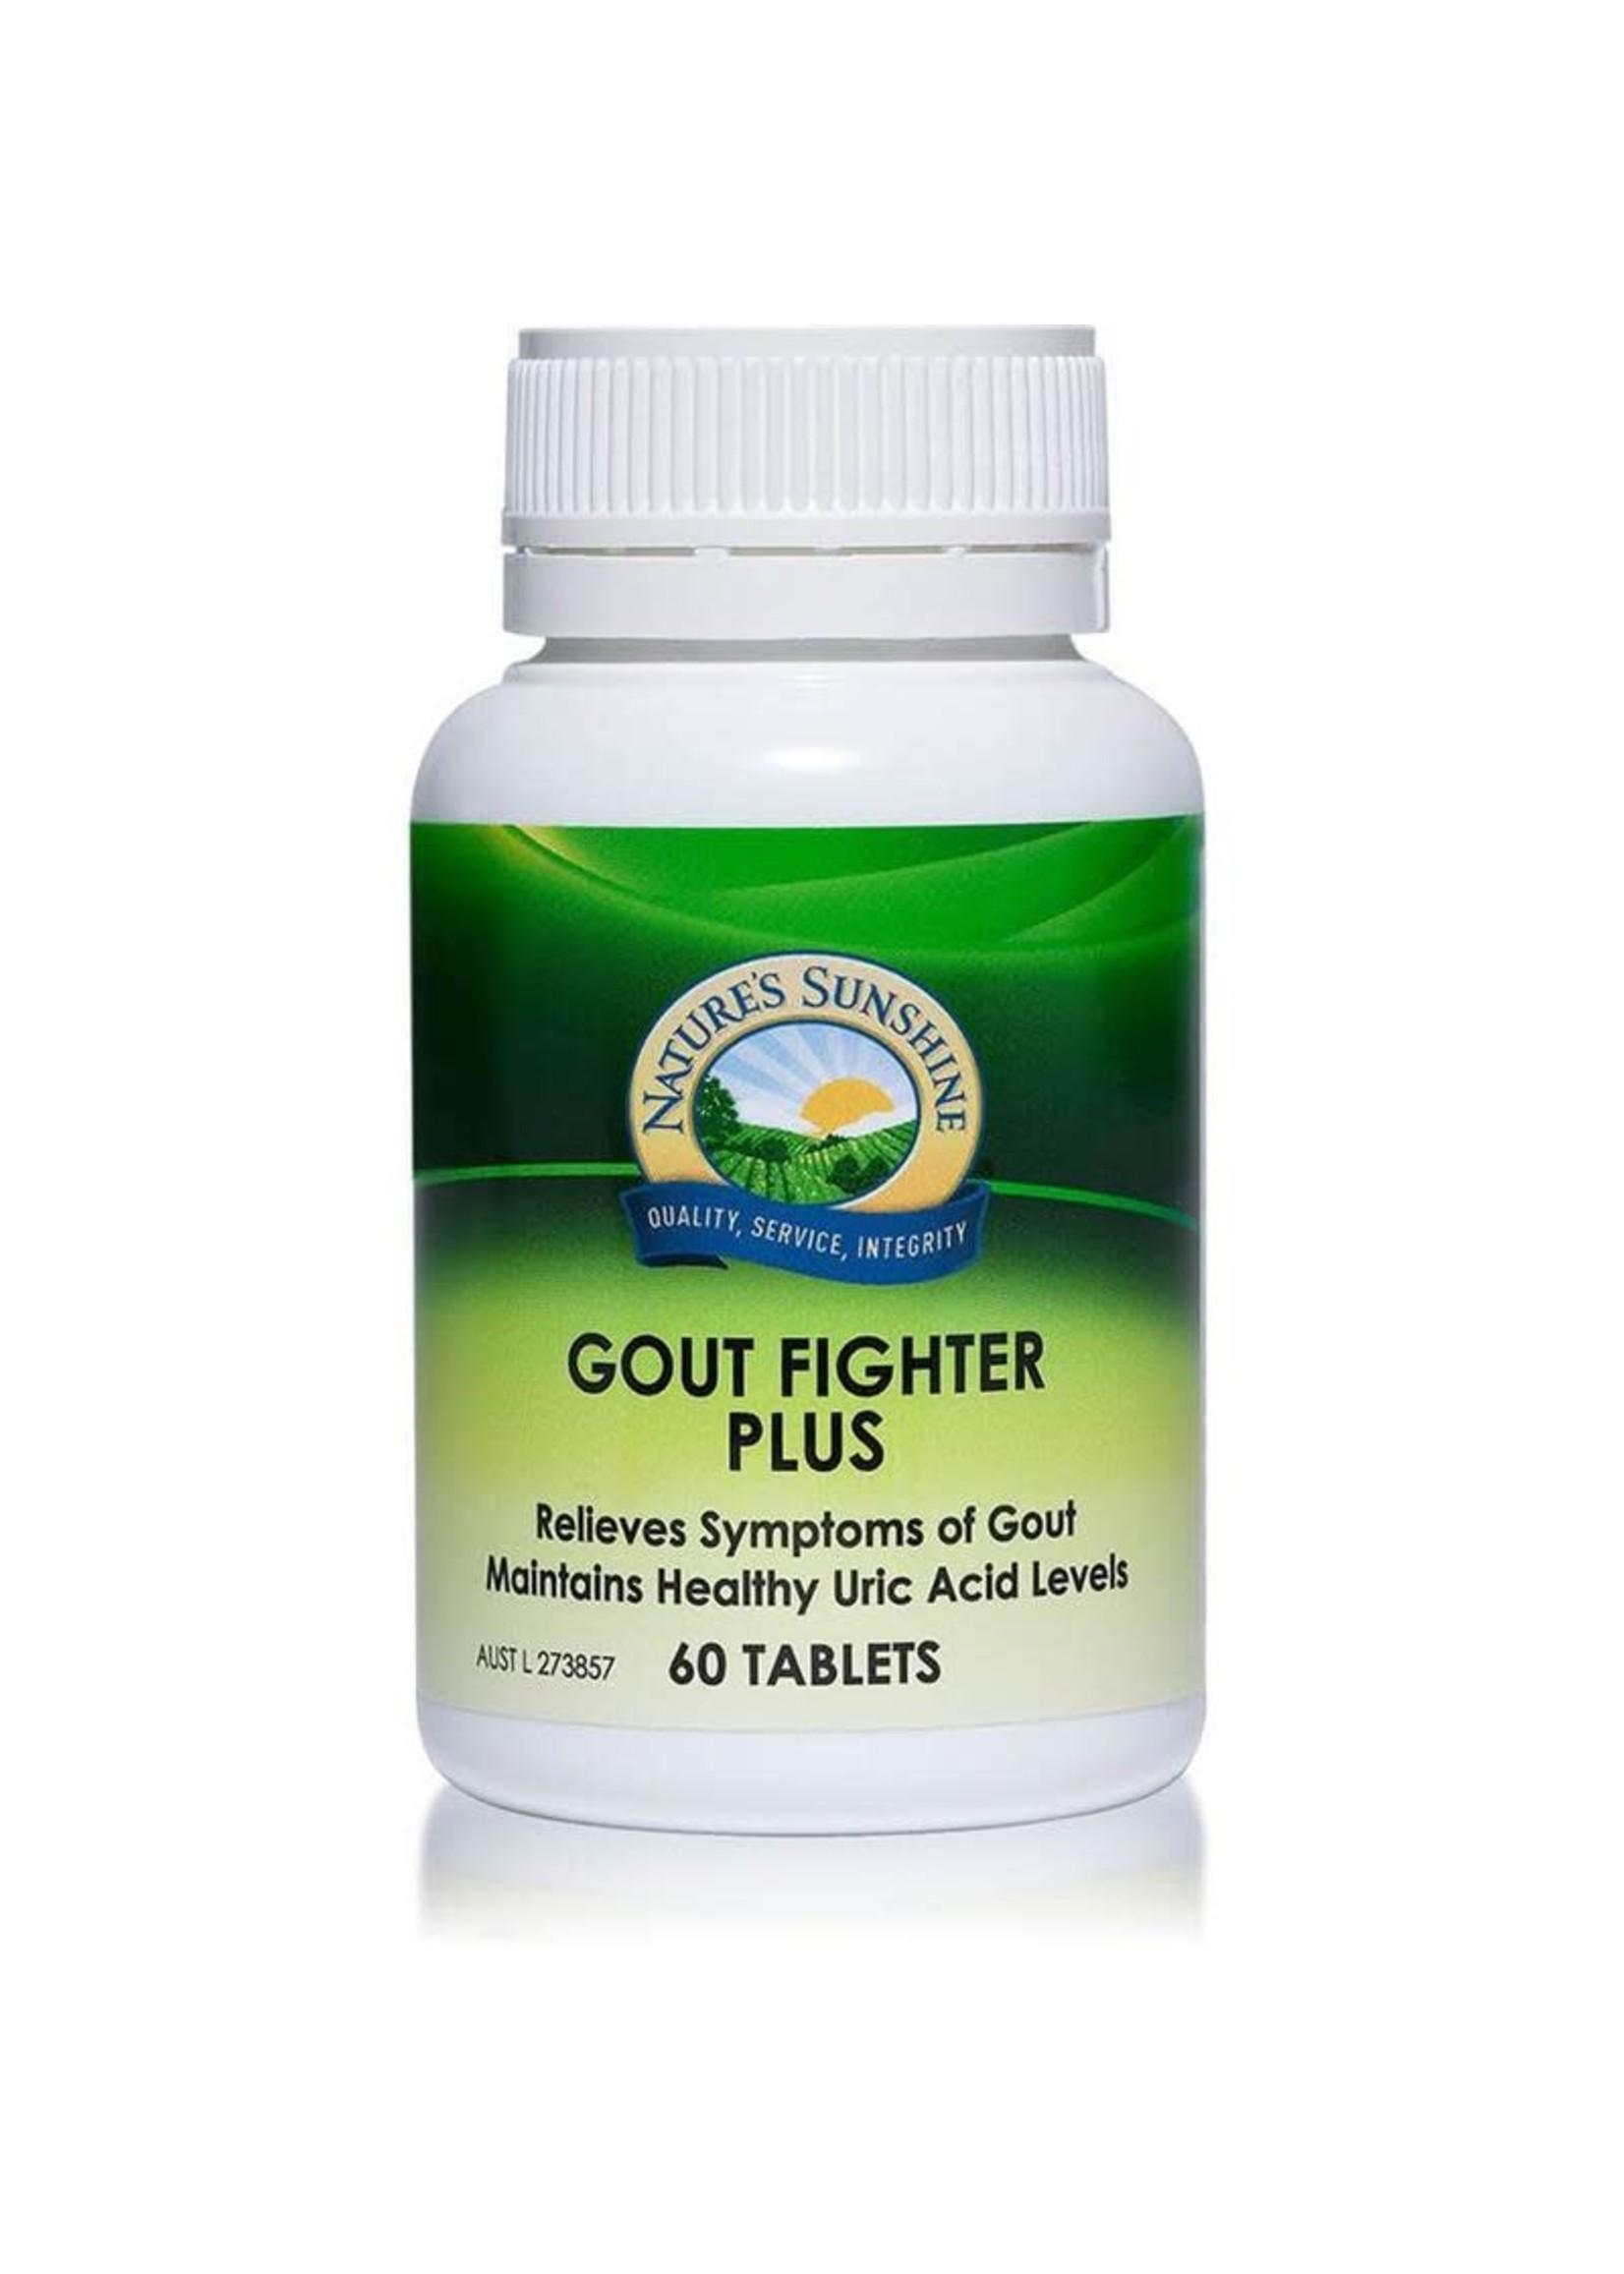 Nature's Sunshine Nature's Sunshine Gout Fighter Plus 60 tabs